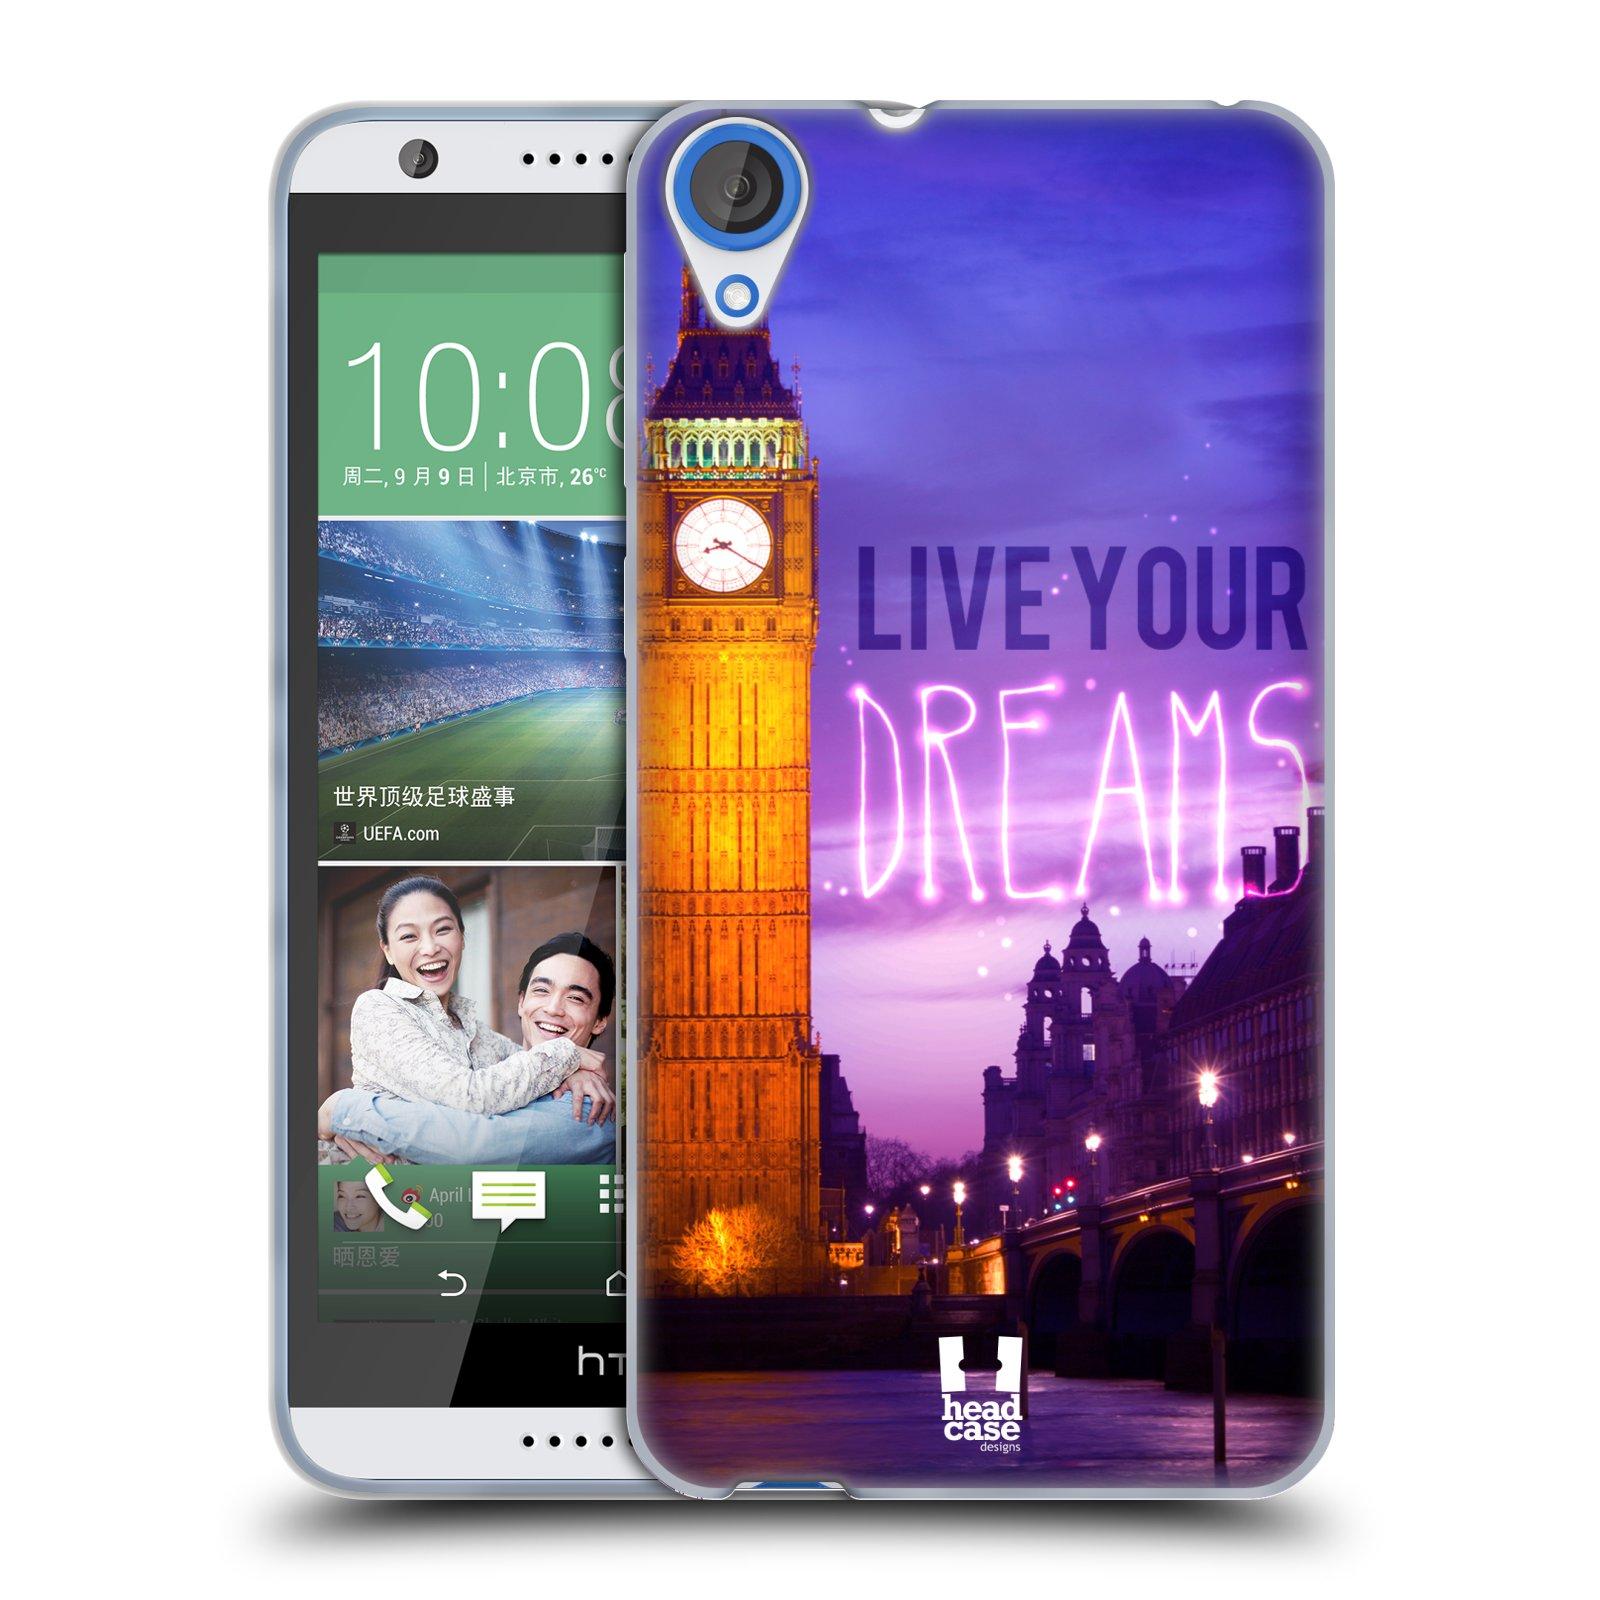 Silikonové pouzdro na mobil HTC Desire 820 HEAD CASE DREAMS (Silikonový kryt či obal na mobilní telefon HTC Desire 820)